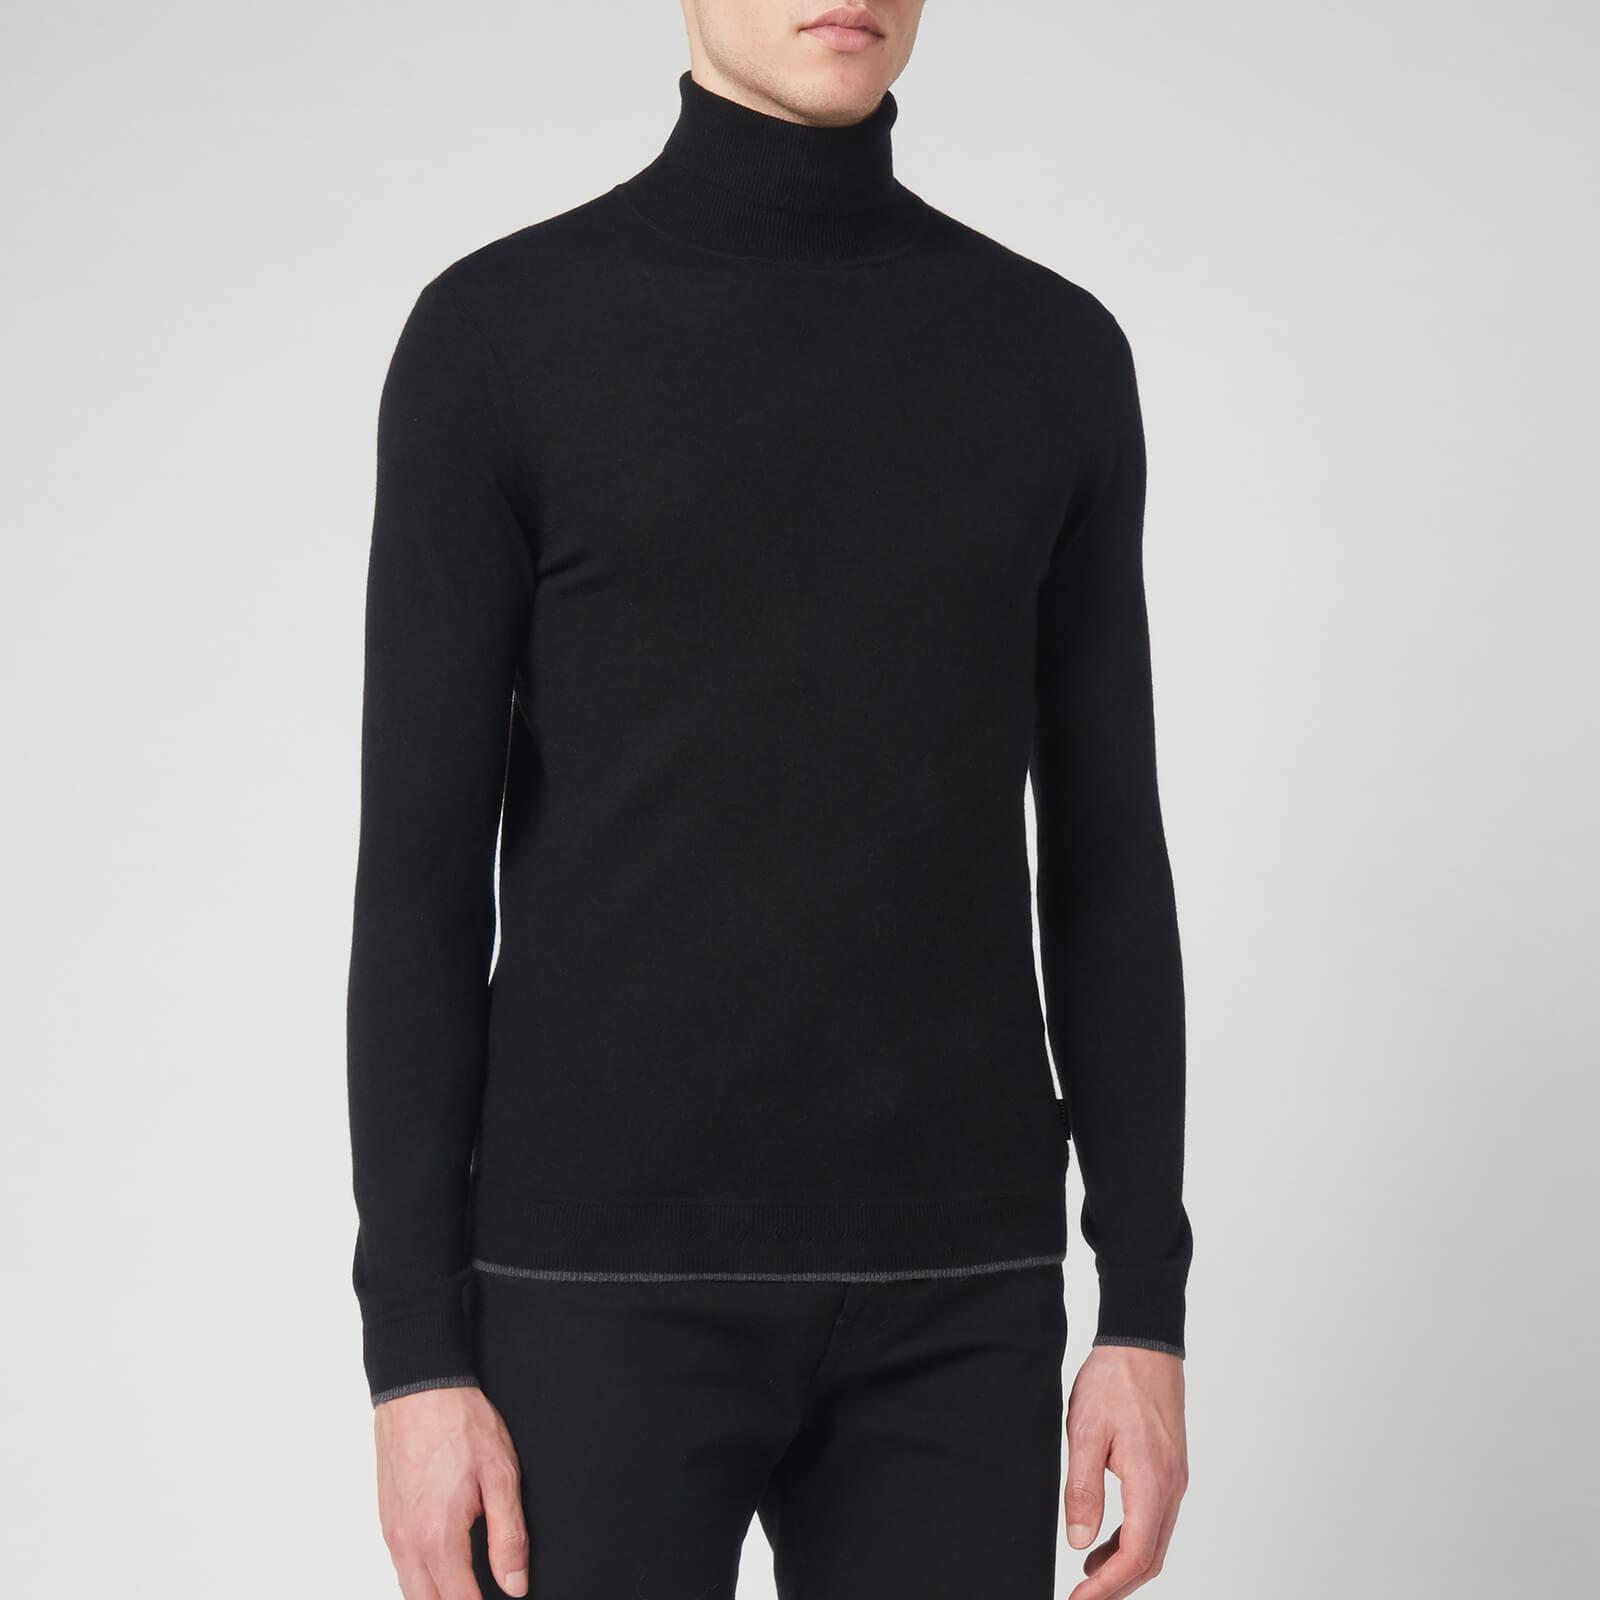 Ted Baker Men's Newtrik Fitted Roll Neck Sweatshirt - Black - XL/5